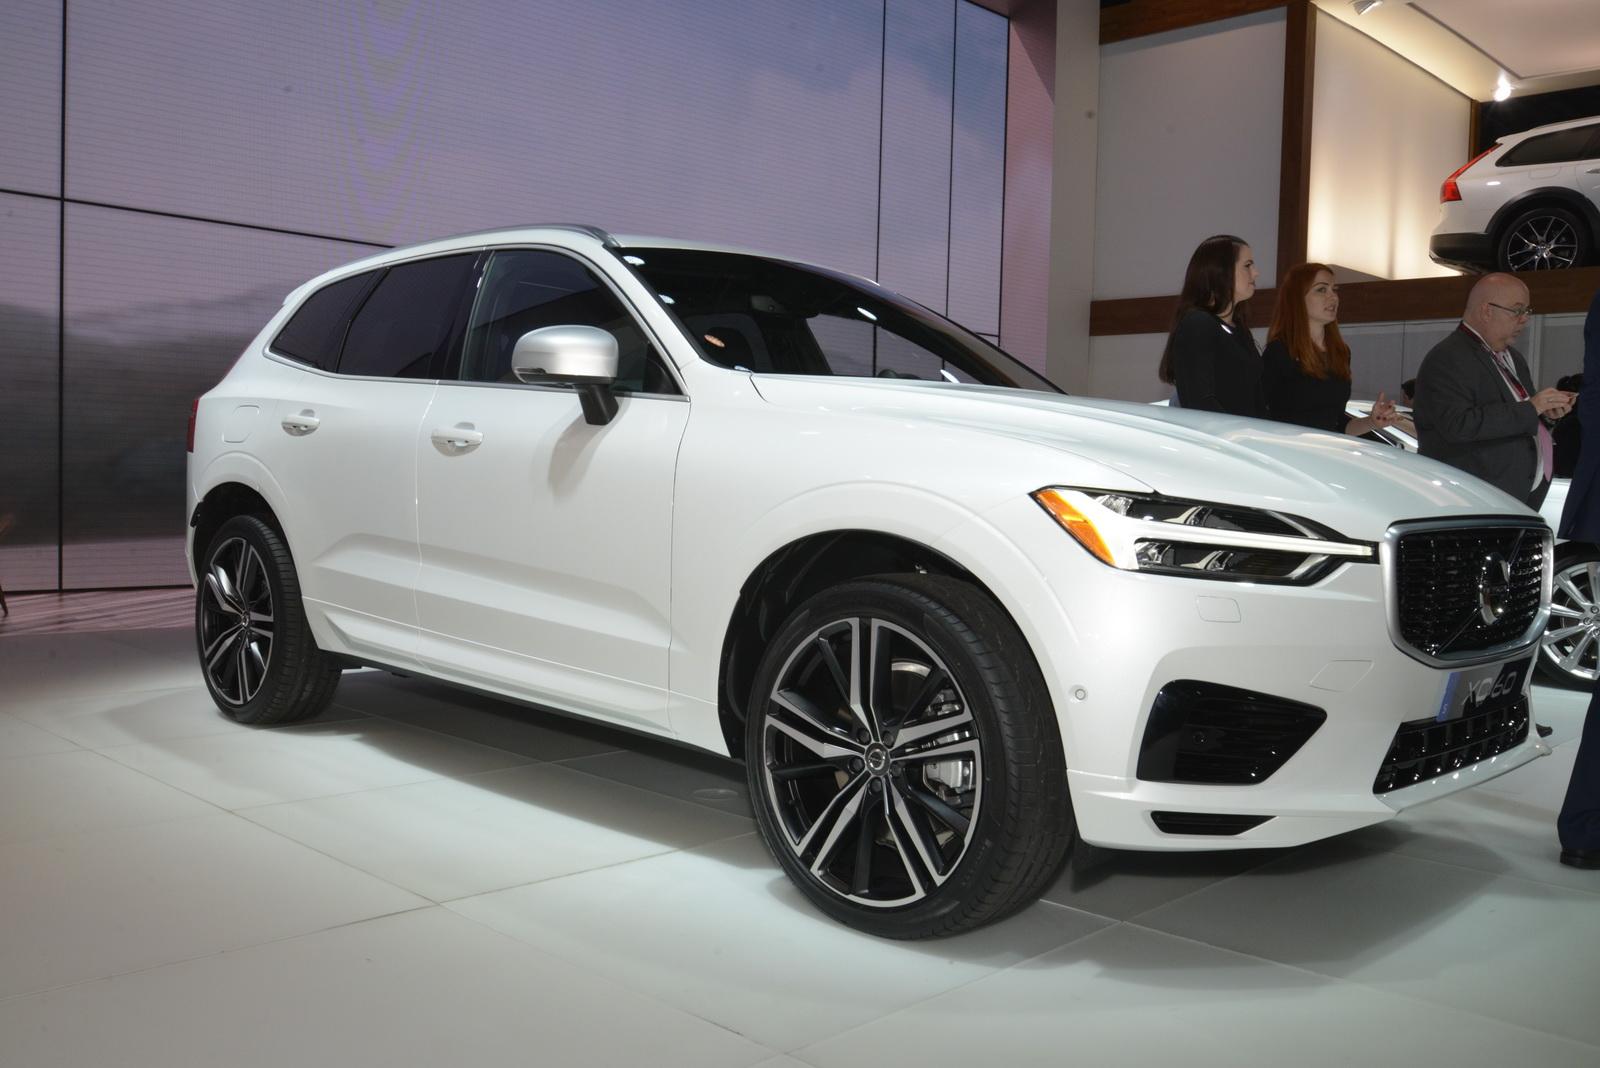 NY Show: 2018 Volvo XC60 Looks Doomed For Success | Carscoops